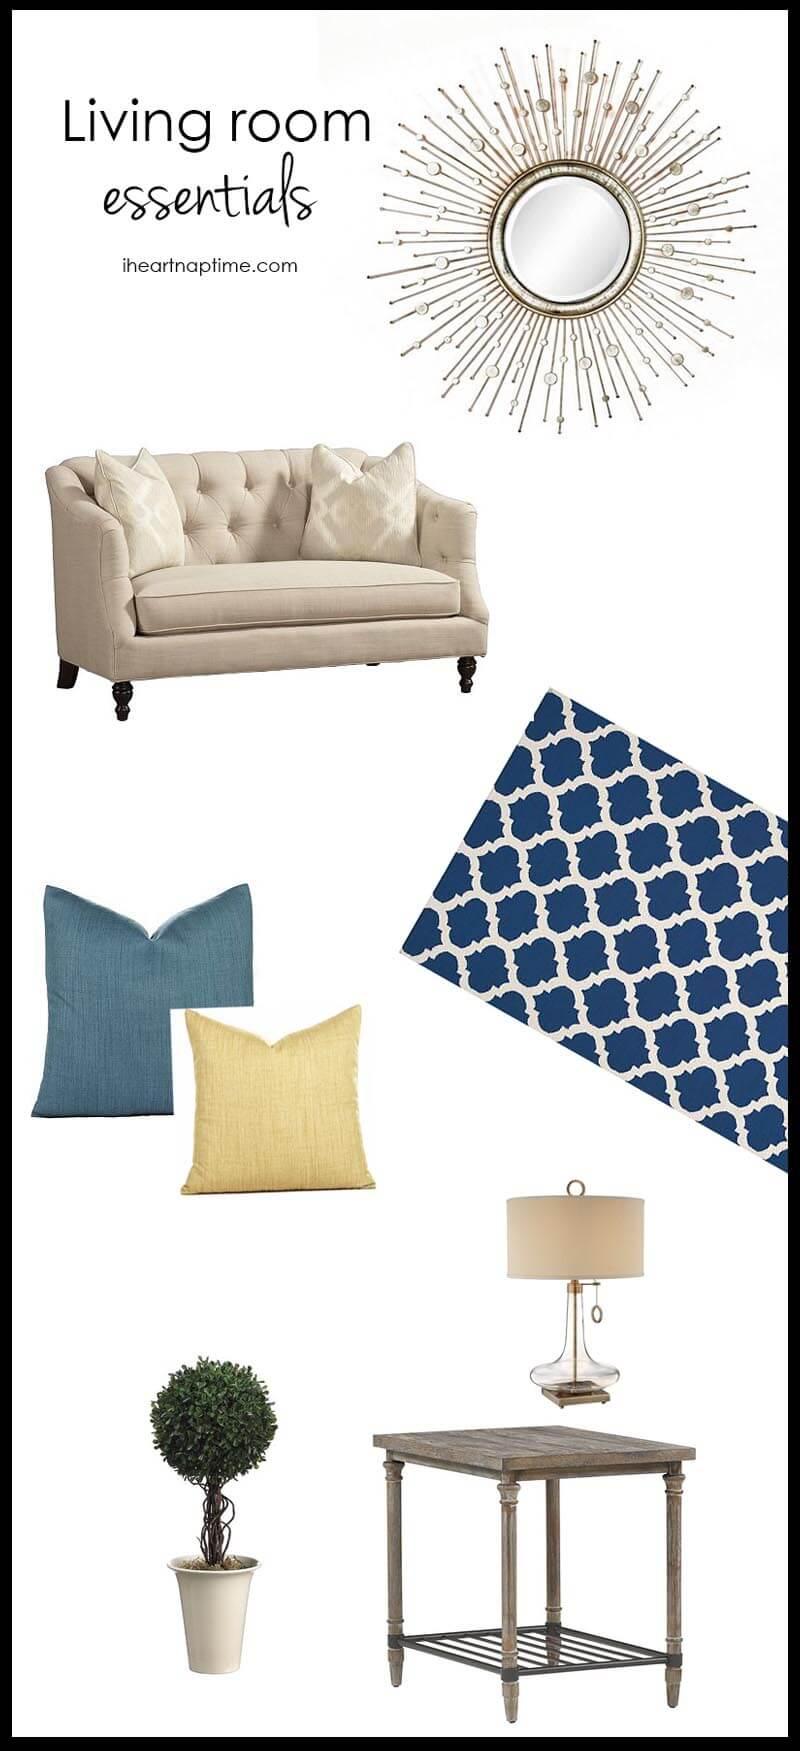 Living Room Essentials List